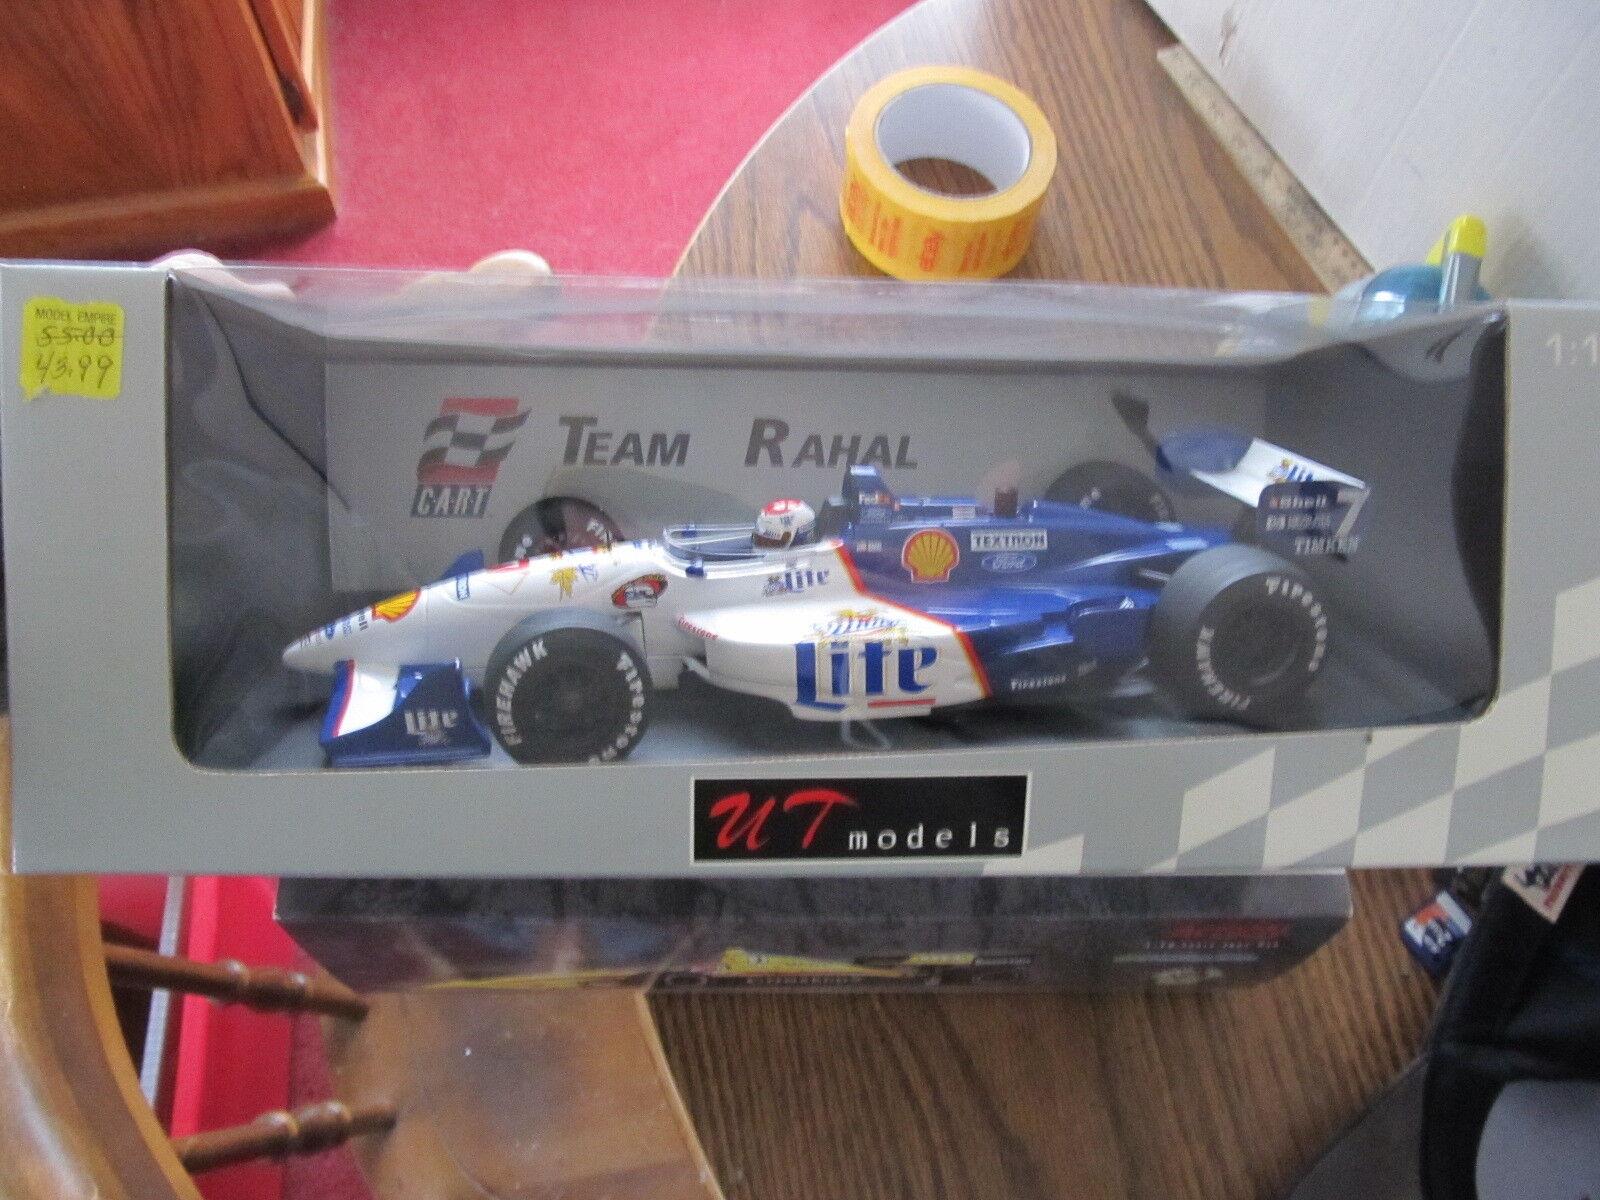 Ut modelle team rahal auto new in box 1,18